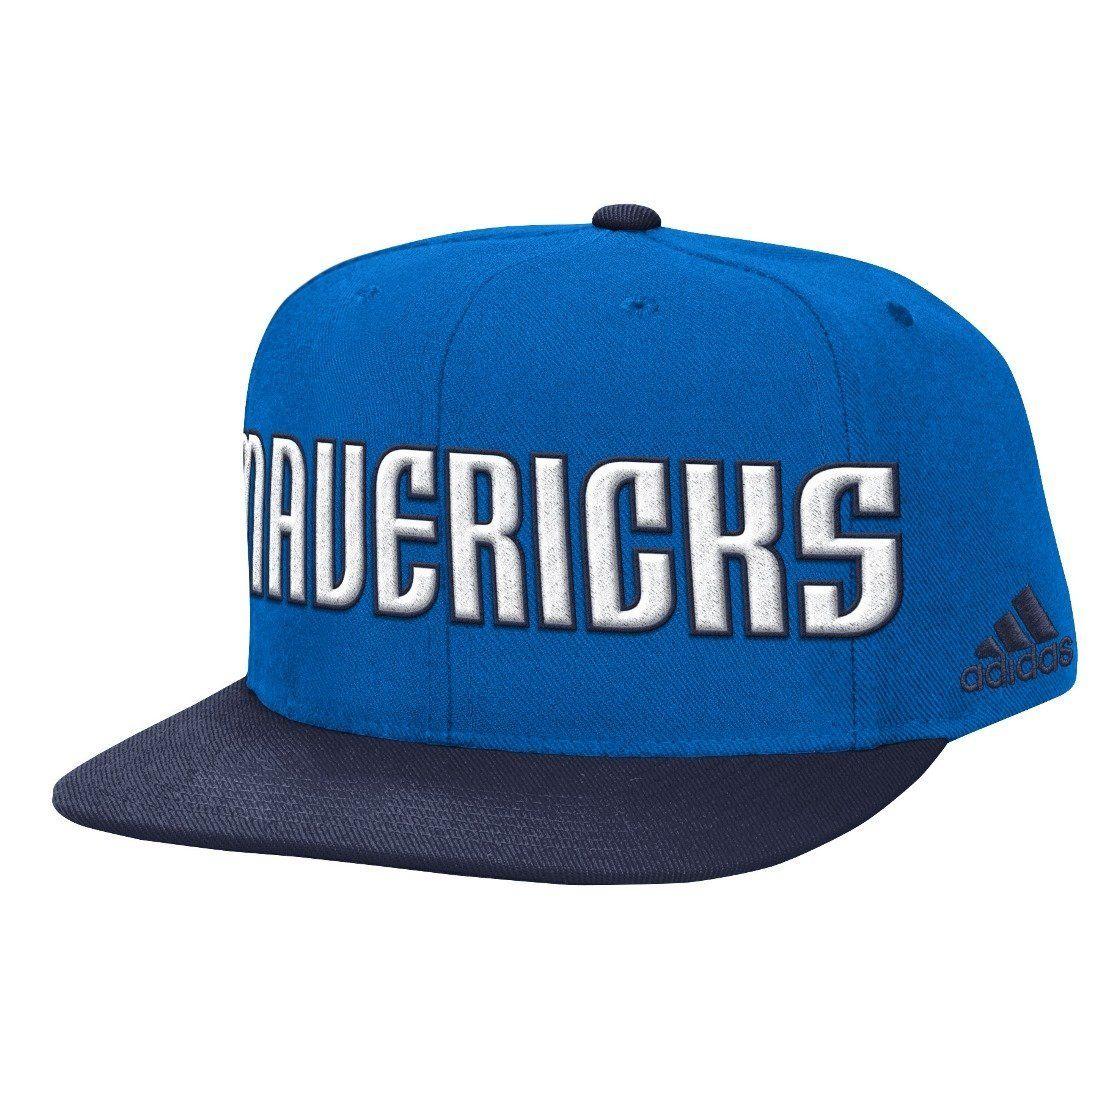 5ed70f3746e28 Dallas Mavericks Adidas NBA Authentic On-Court Snap Back Hat